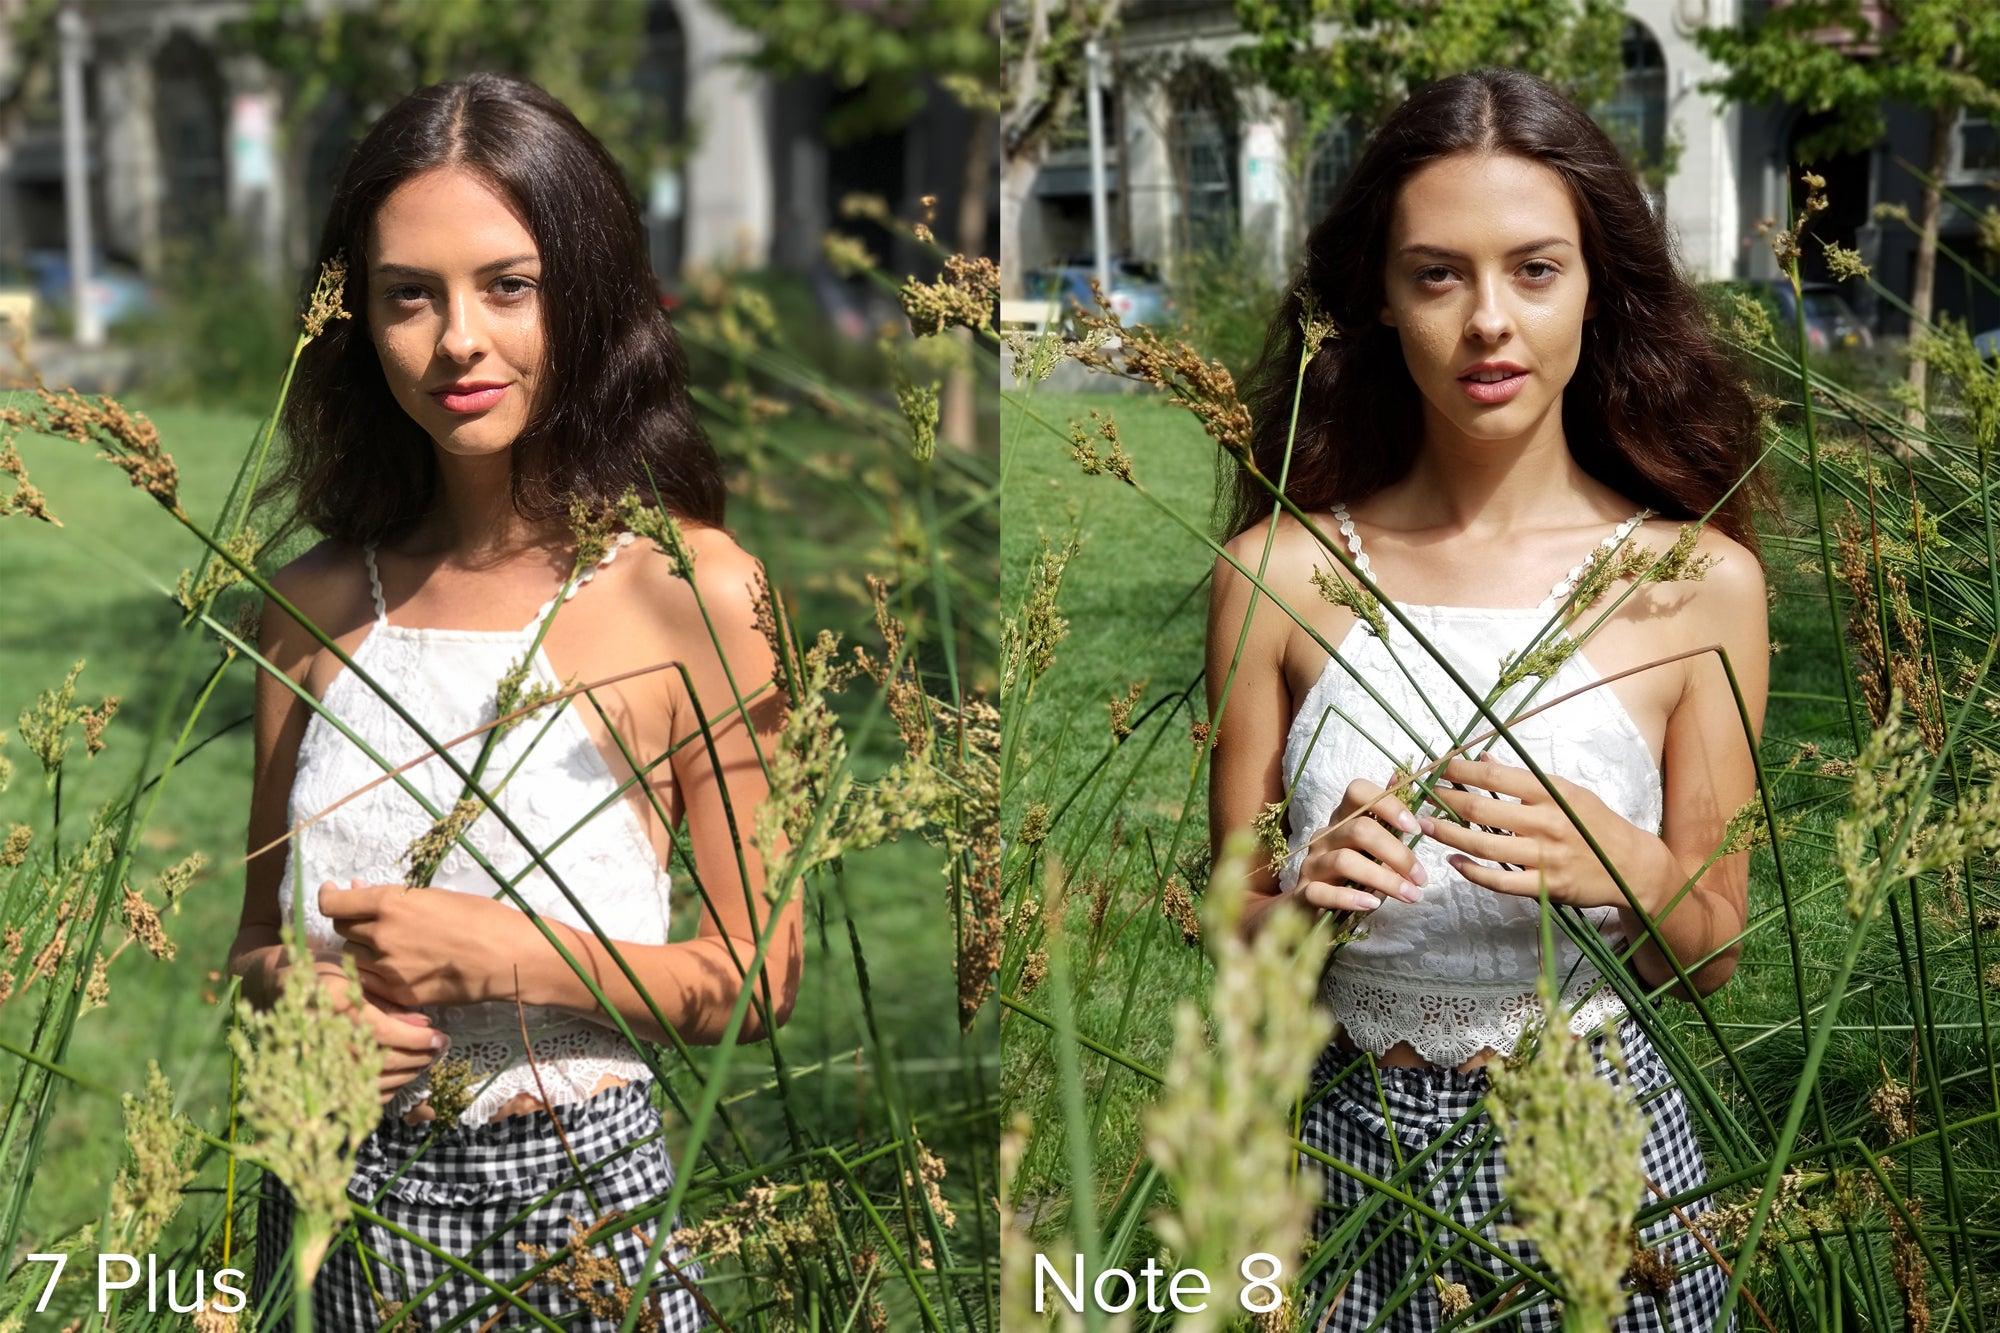 Tested Galaxy Note 8 Live Focus Vs Iphone 7 Plus Portrait